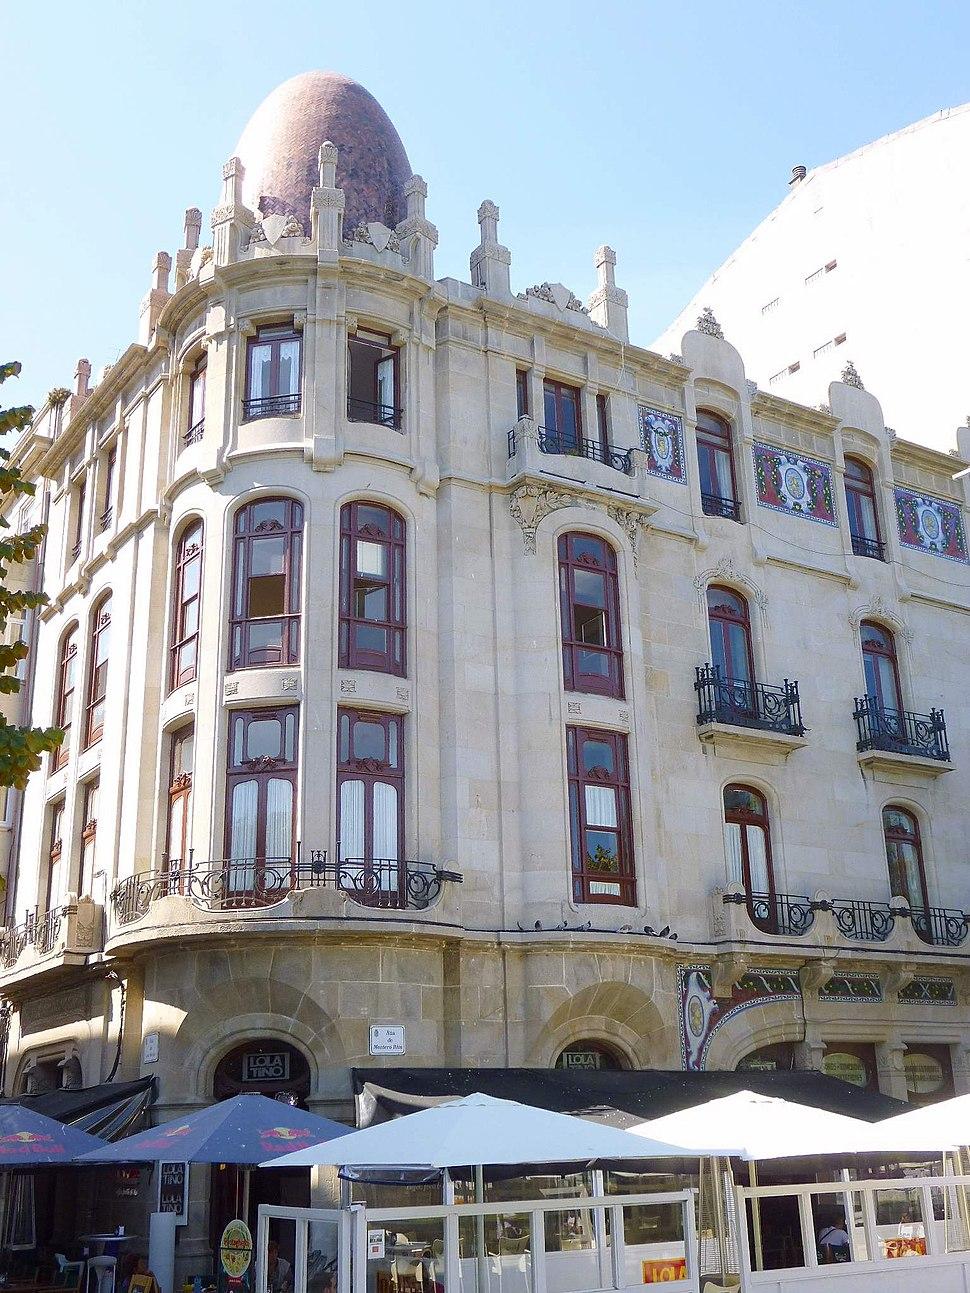 Vigo - Edificio Mülder